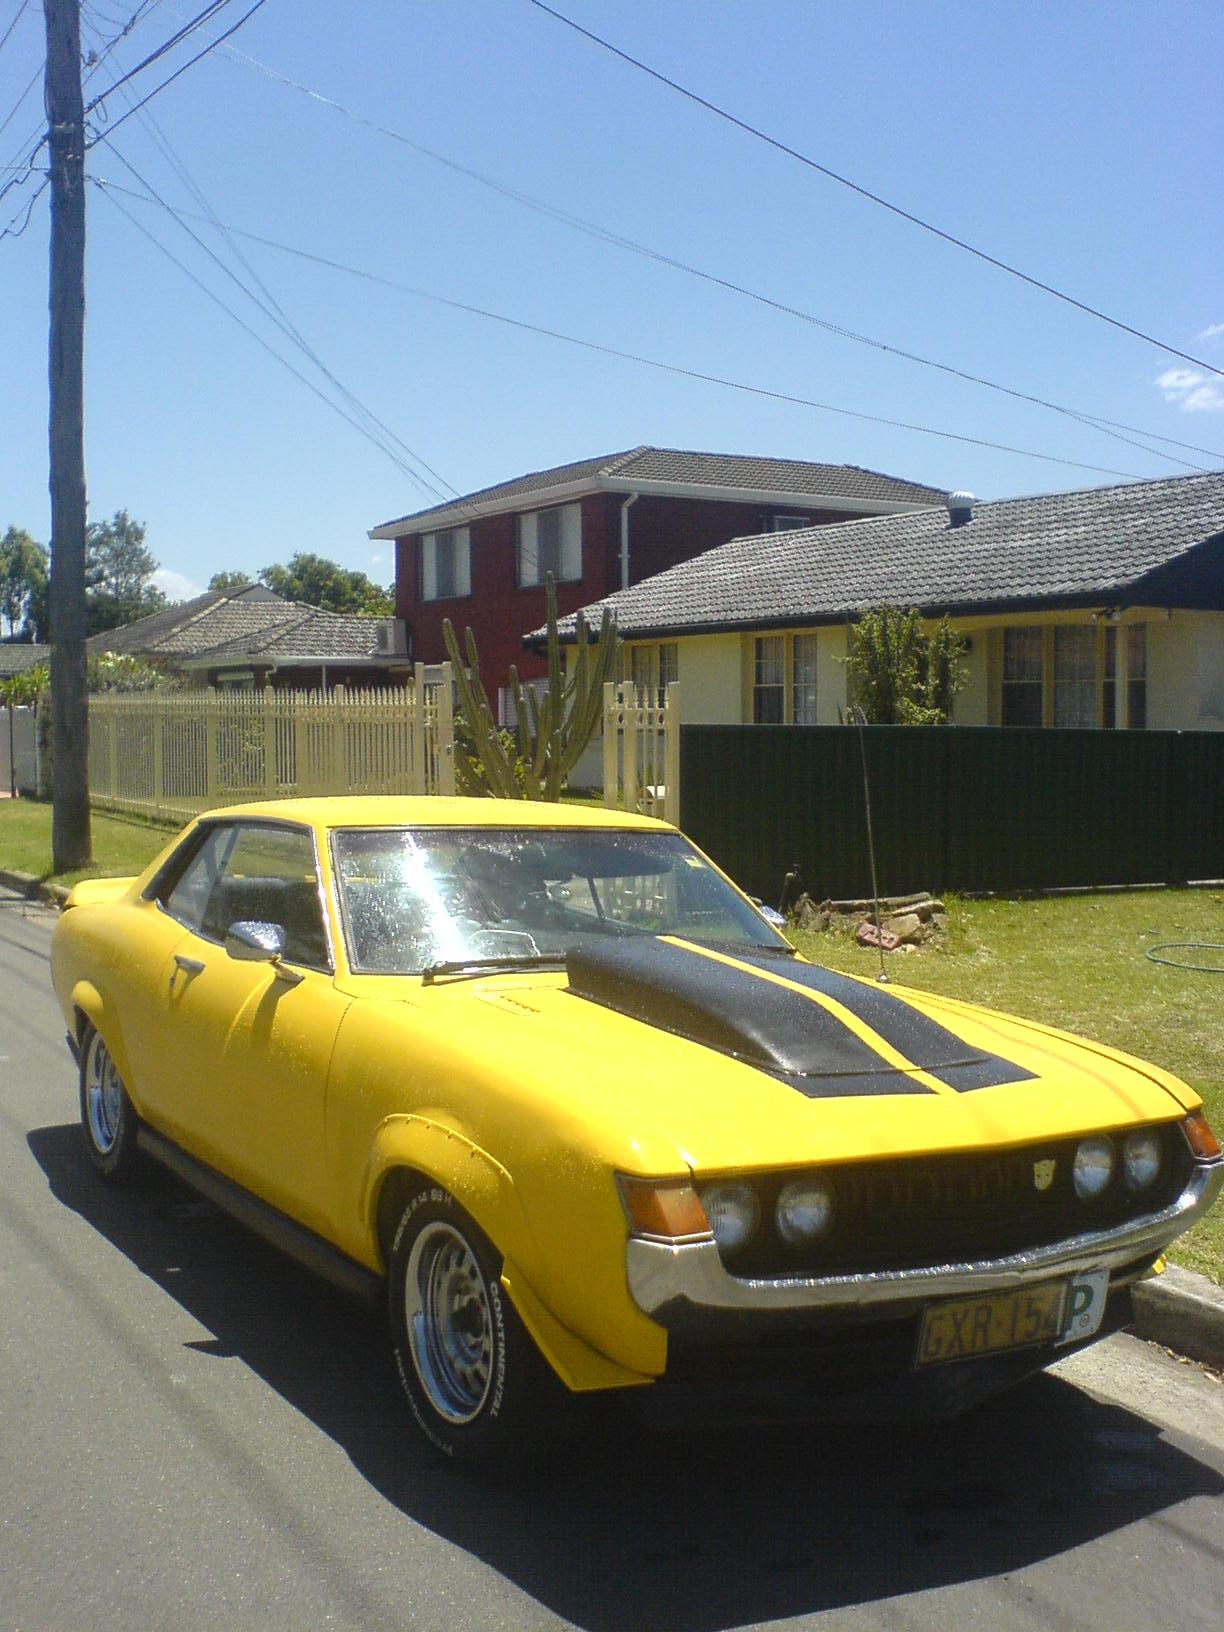 1974 Toyota Celica Ta22 For Sale Private Whole Cars